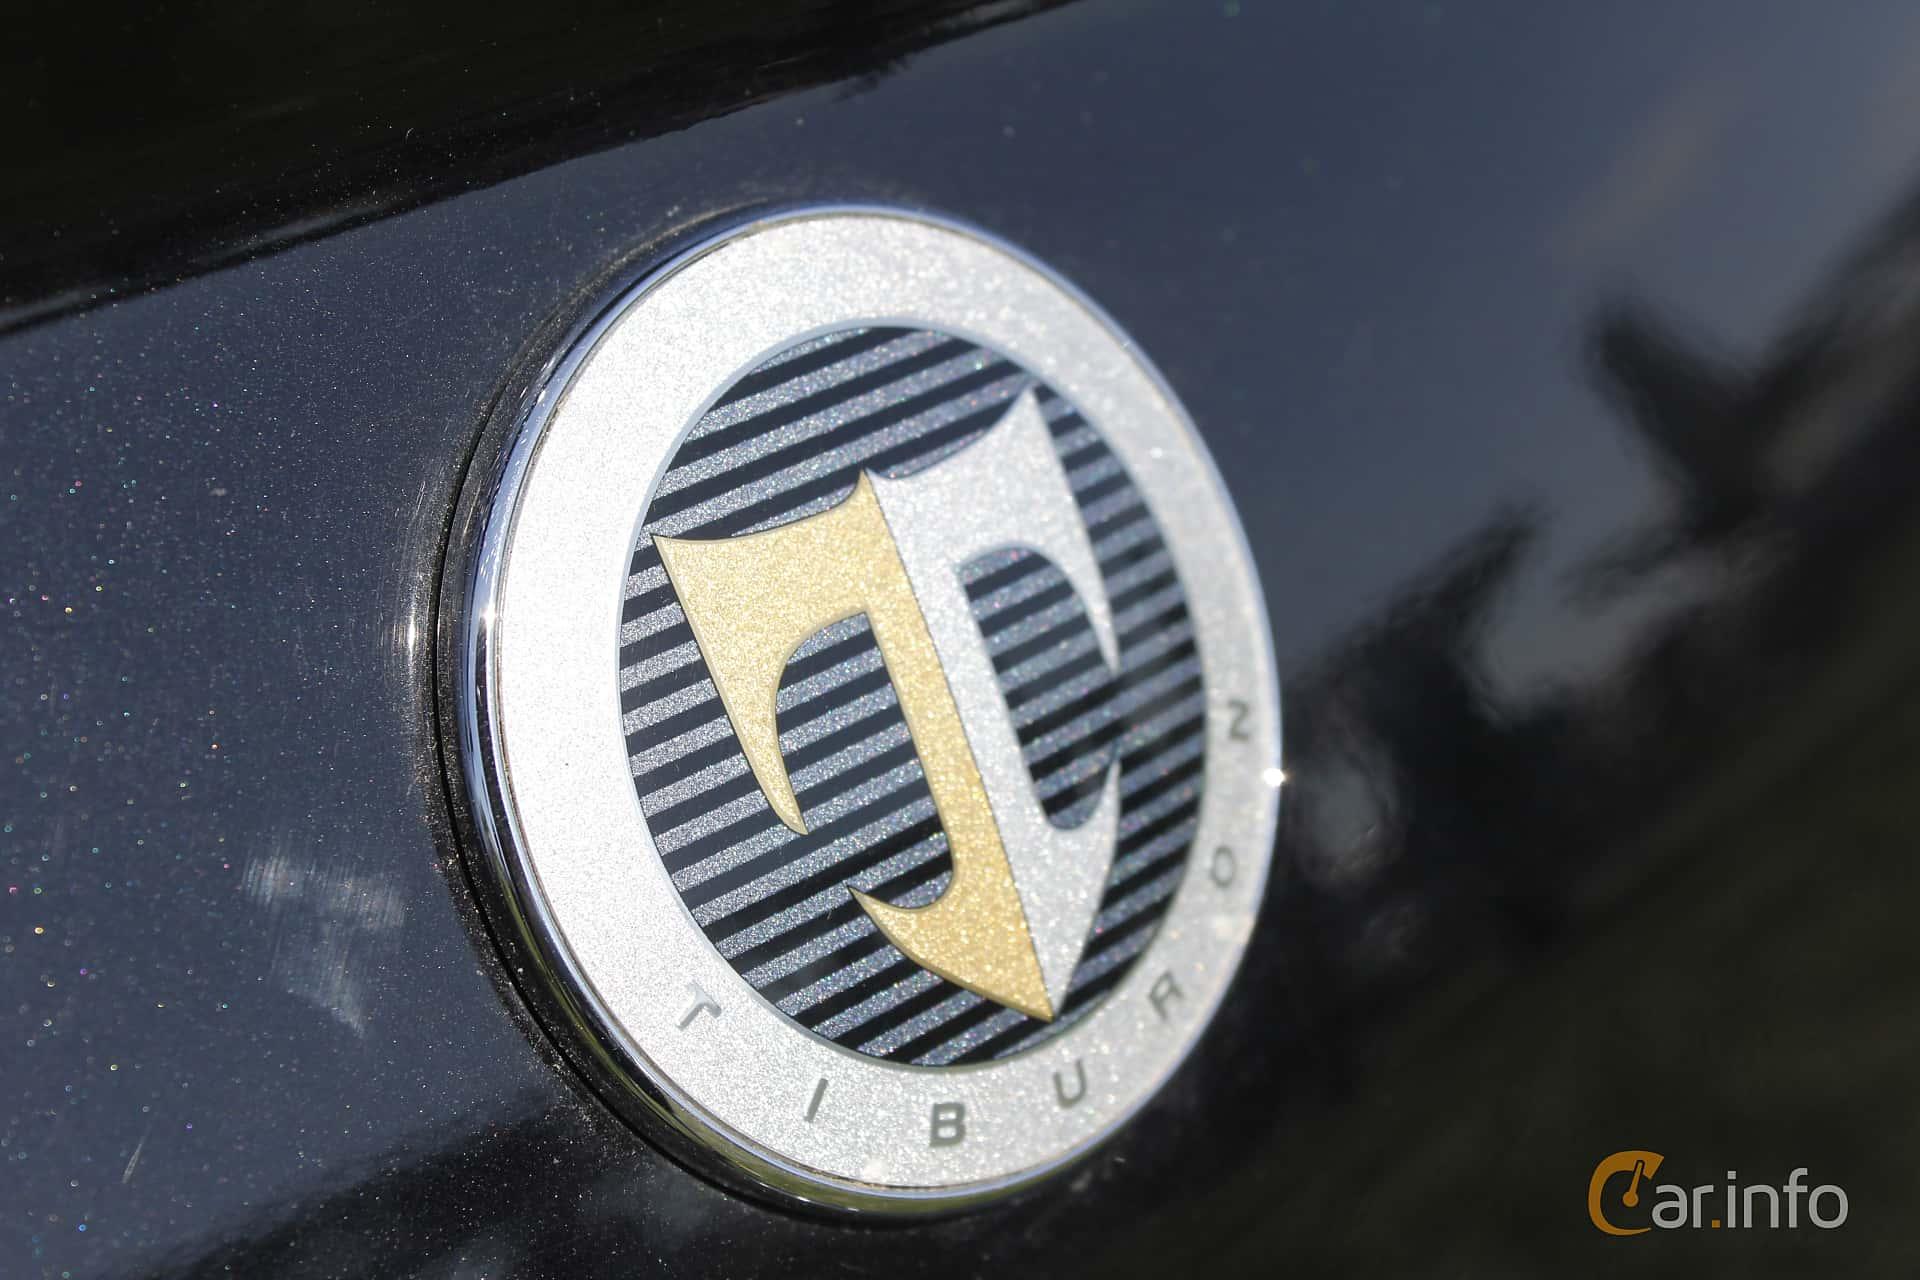 Hyundai Coupé 2.0 Manual, 143hp, 2010 at Old Car Land no.1 2018